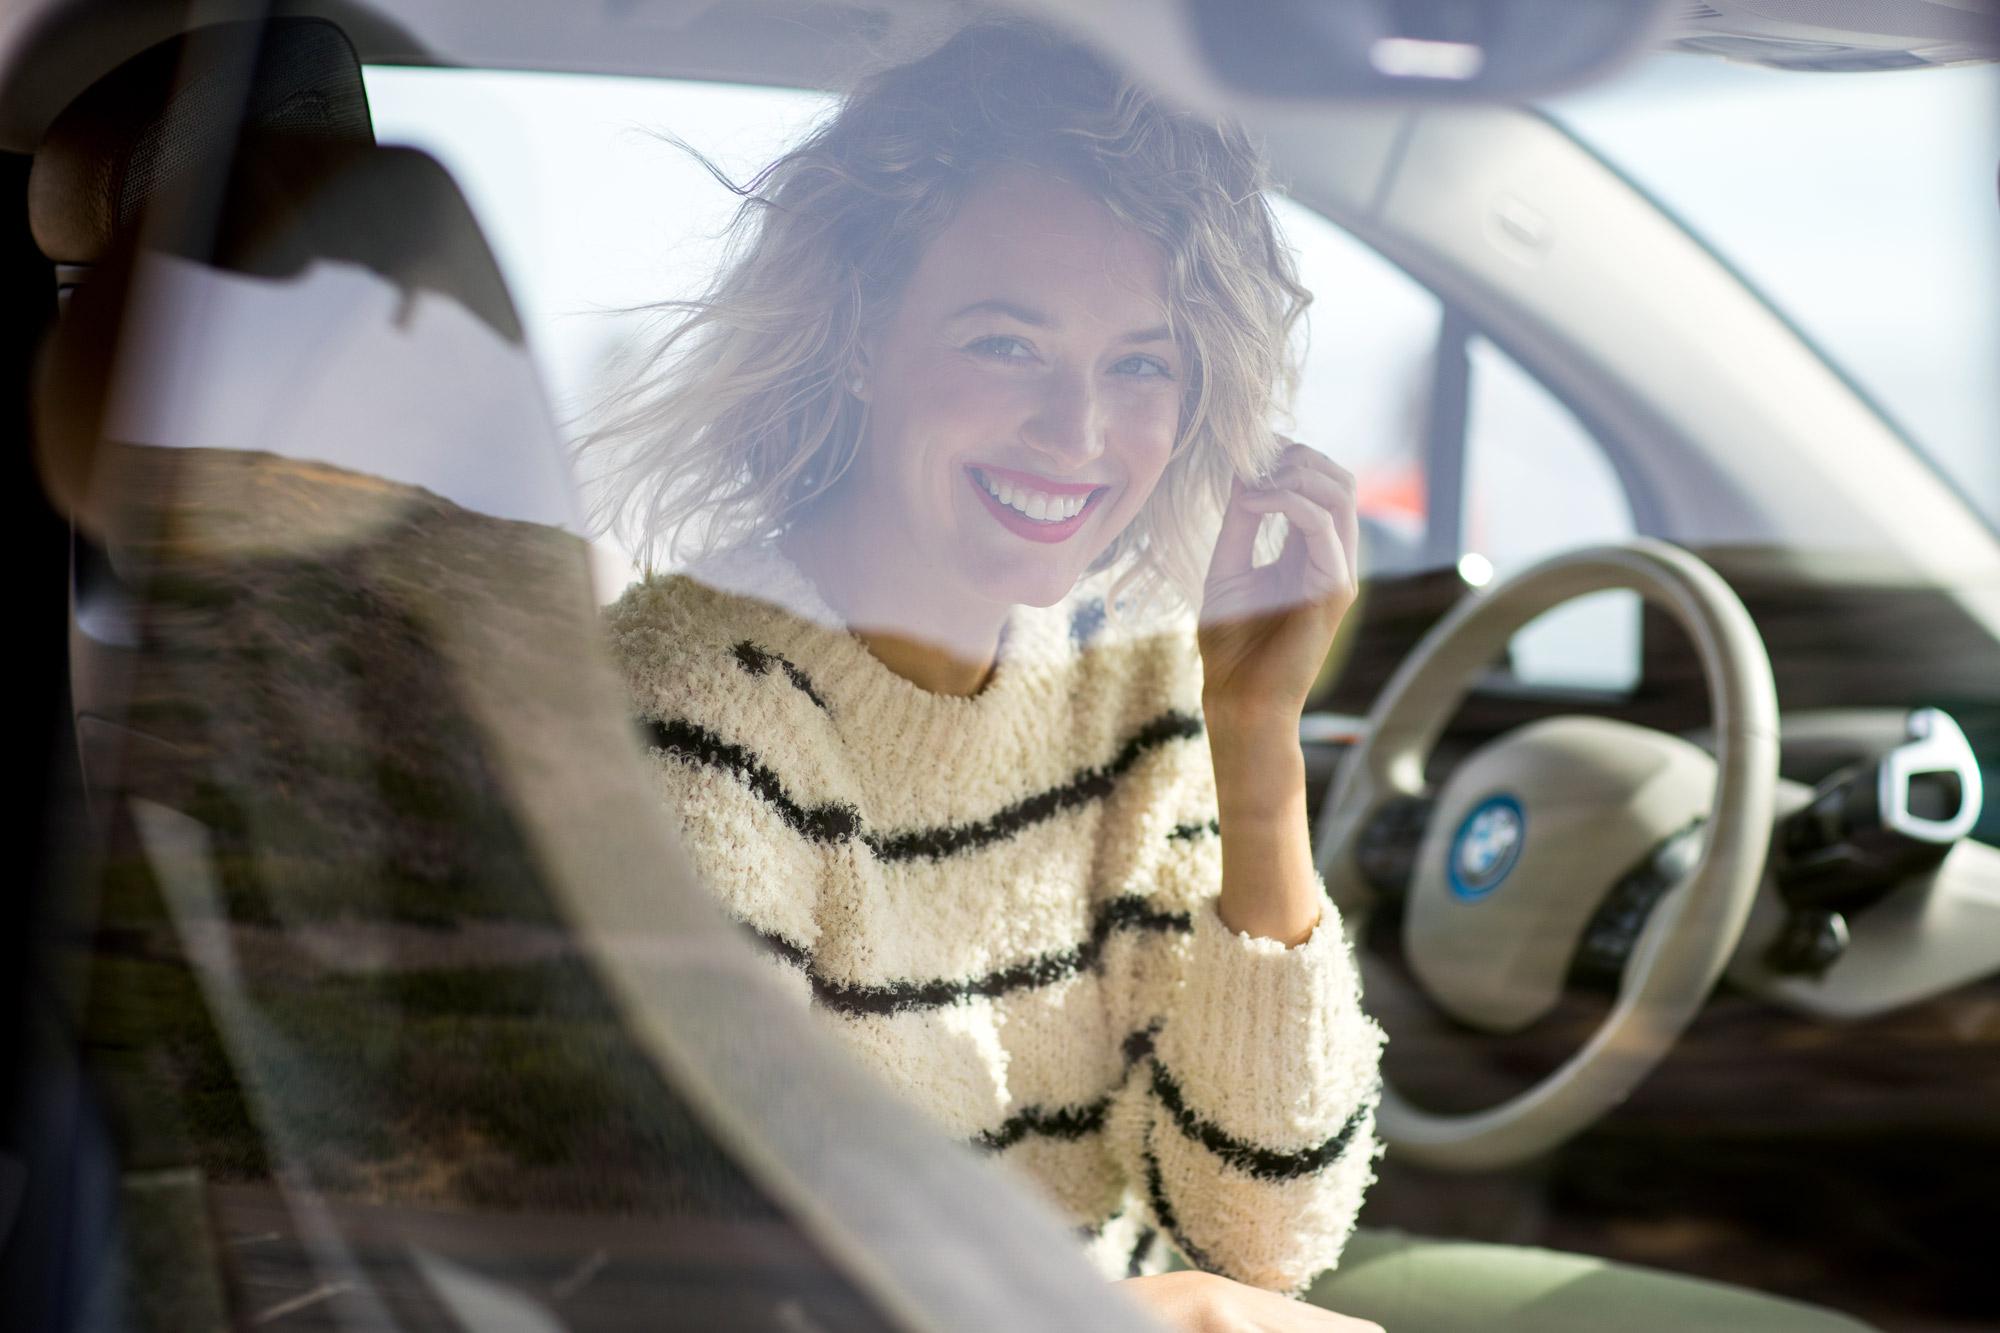 lou-mora-bmw-i3-automotive-lifestyle-009.jpg